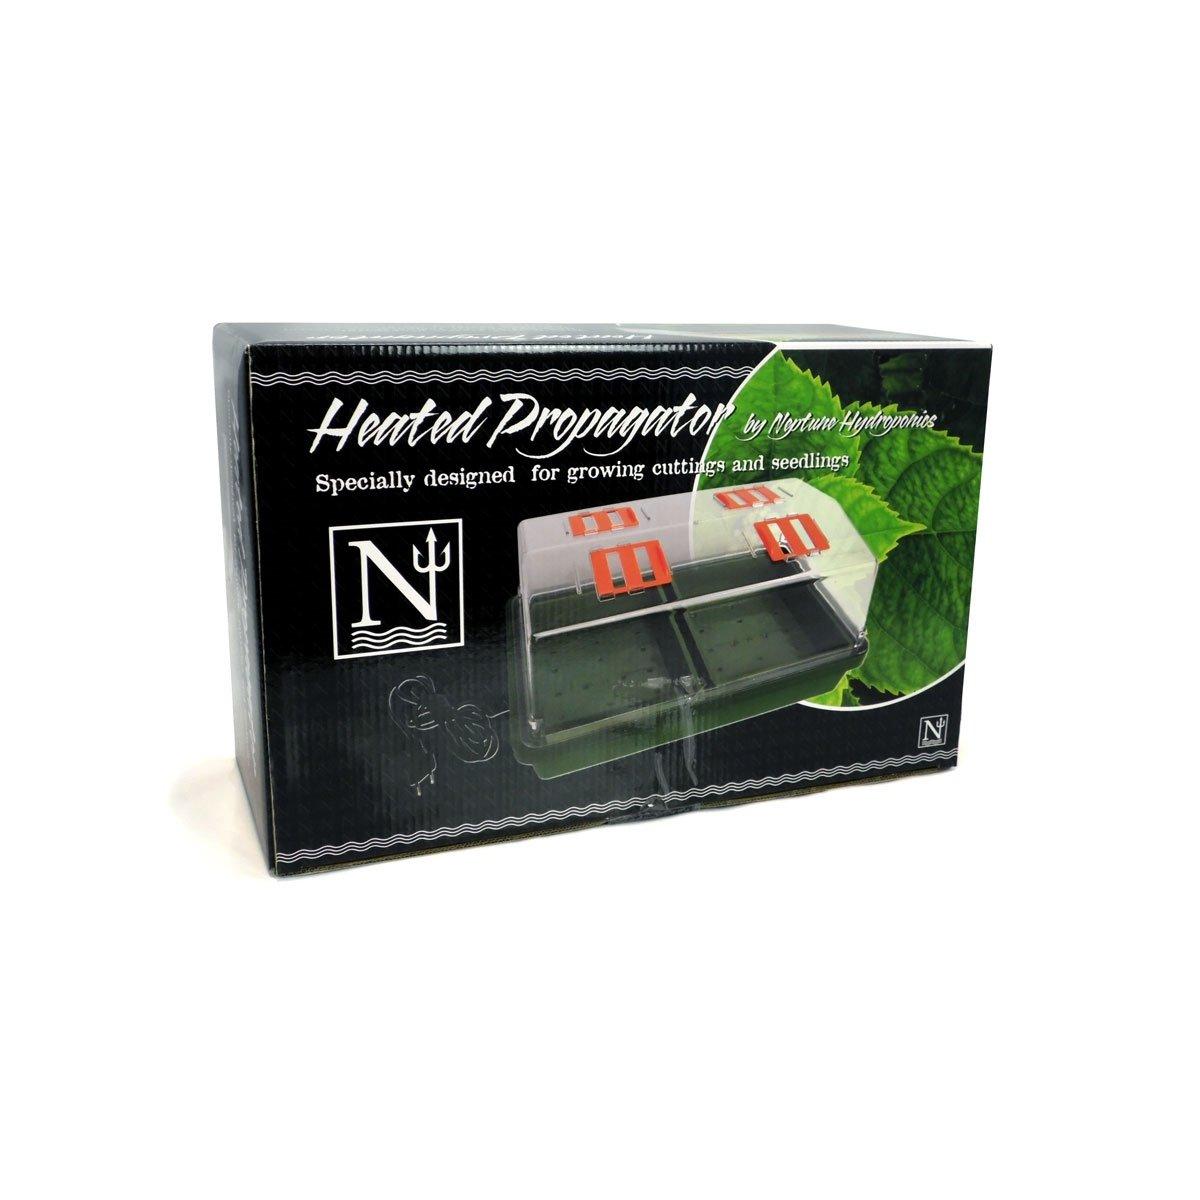 Greenhouse / Electric Propagator for cuttings Neptune Hydroponics (38x24x19cm) FLORATECK